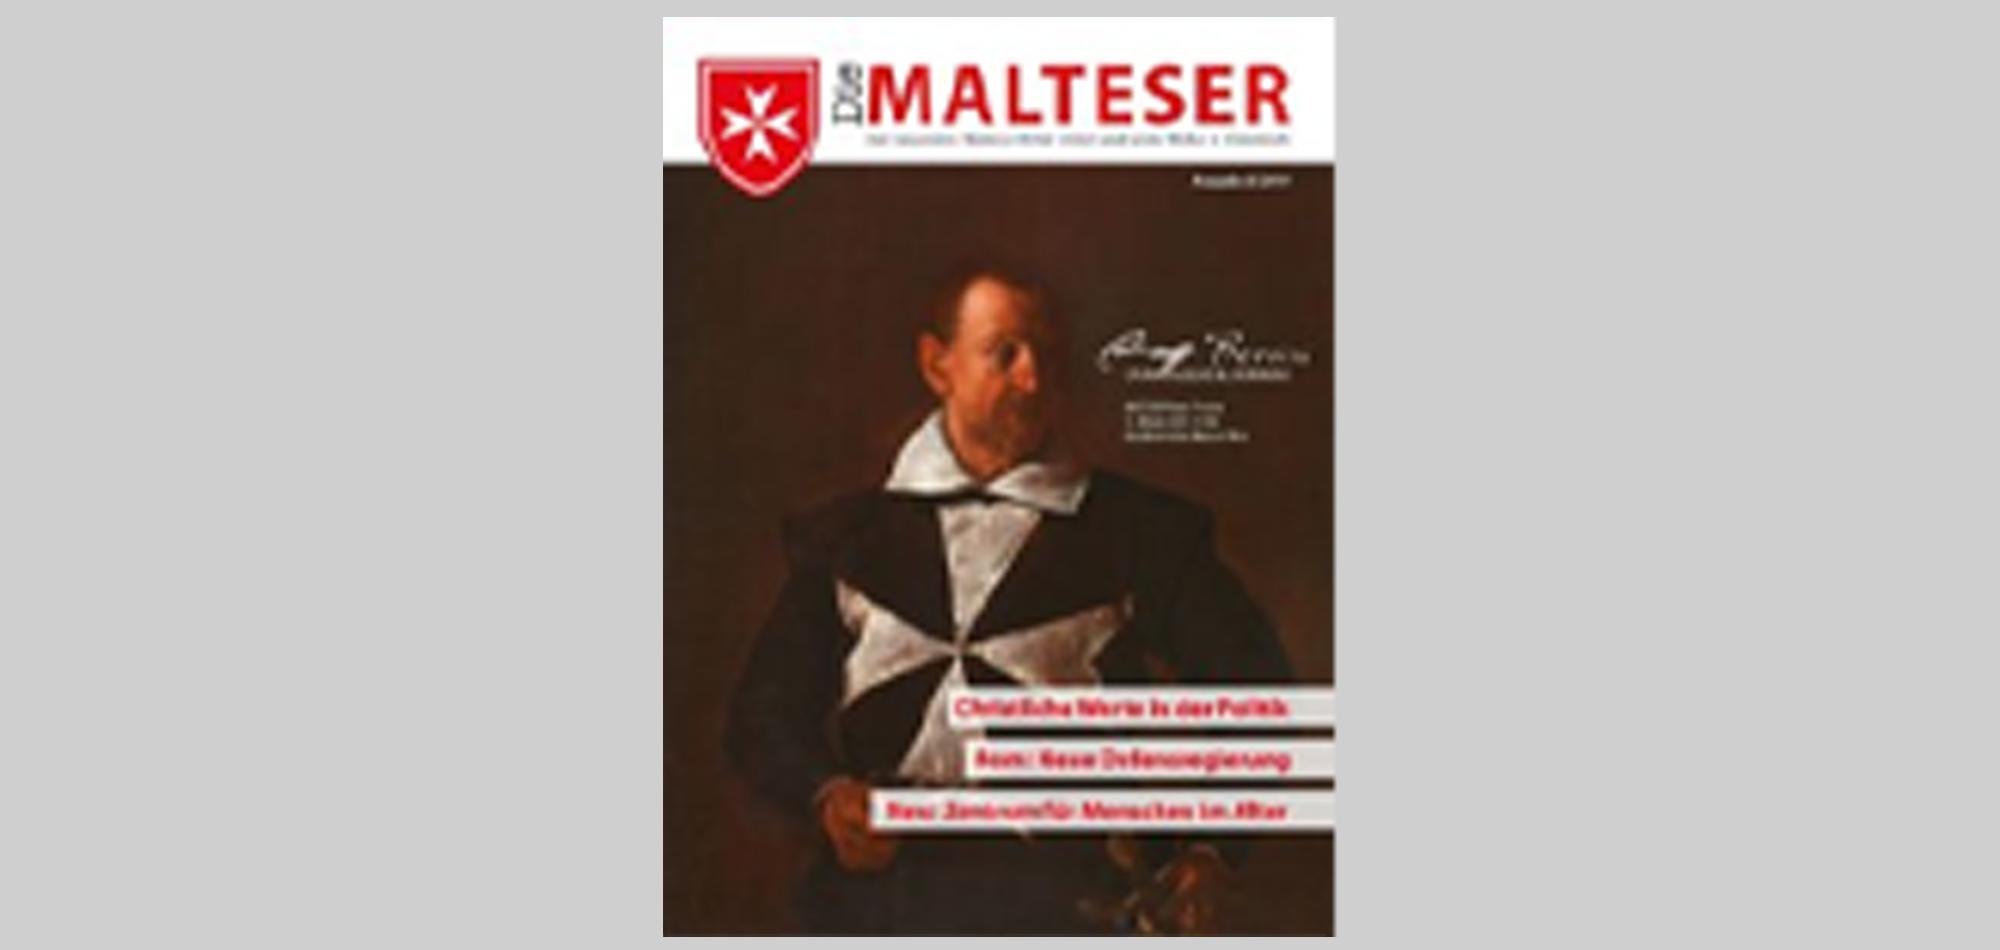 Malteserorden 2000x950 5